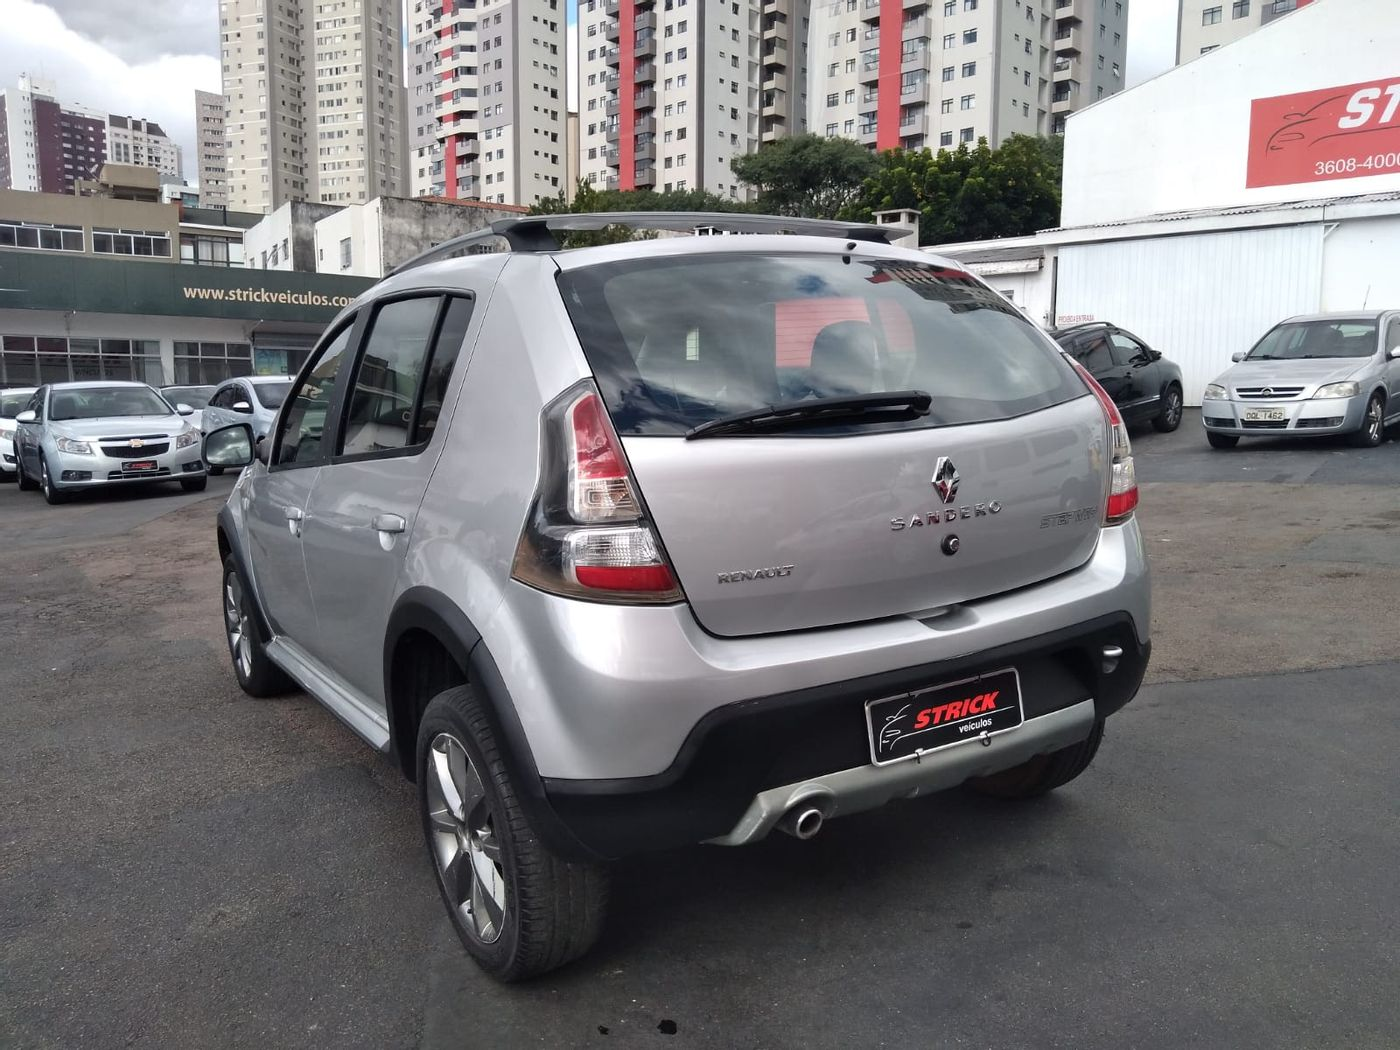 Renault SANDERO STEPWAY Hi-Flex 1.6 16V 5p Aut.